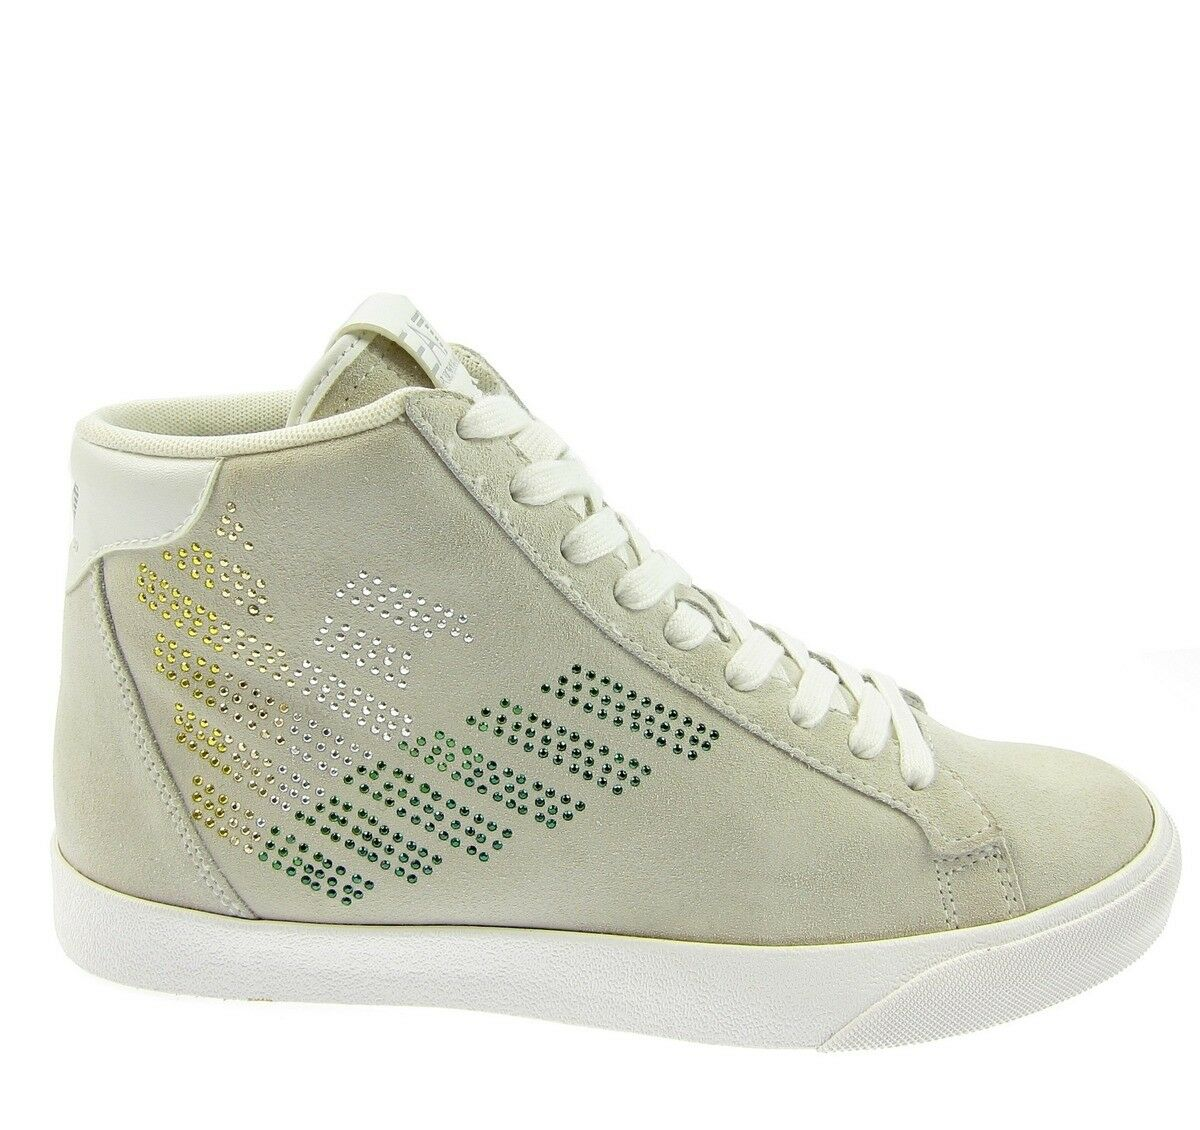 new style c5d2d 23c57 Men s Nike Air Max Vision SE SE SE Running Shoes 918231-006 8ea06f ...